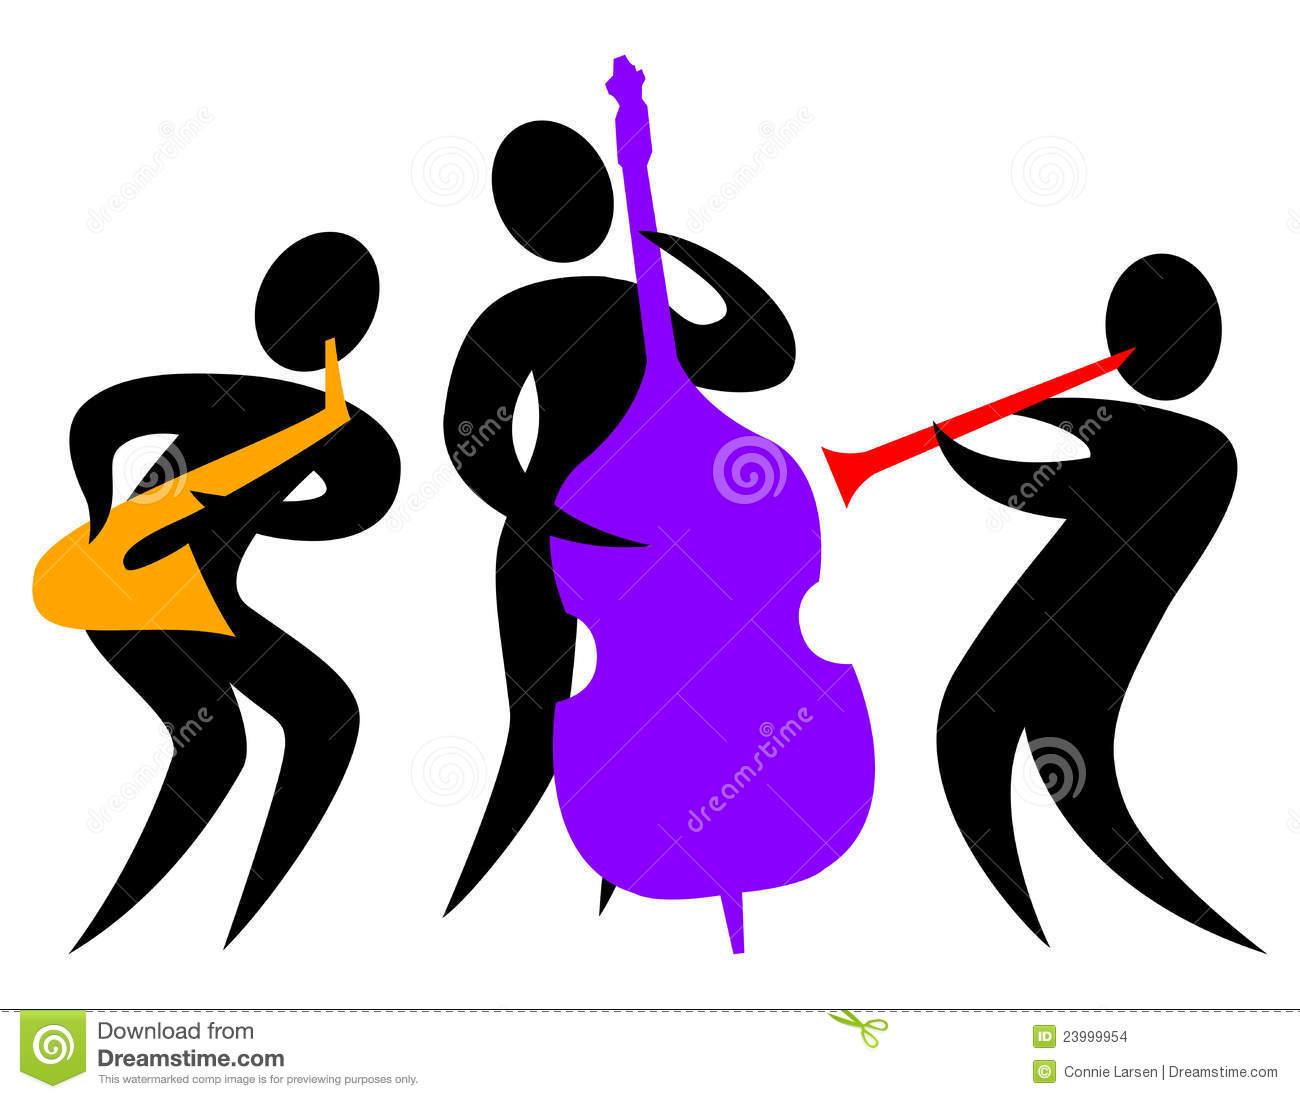 Jazz clipart. Panda free images jazzclipart